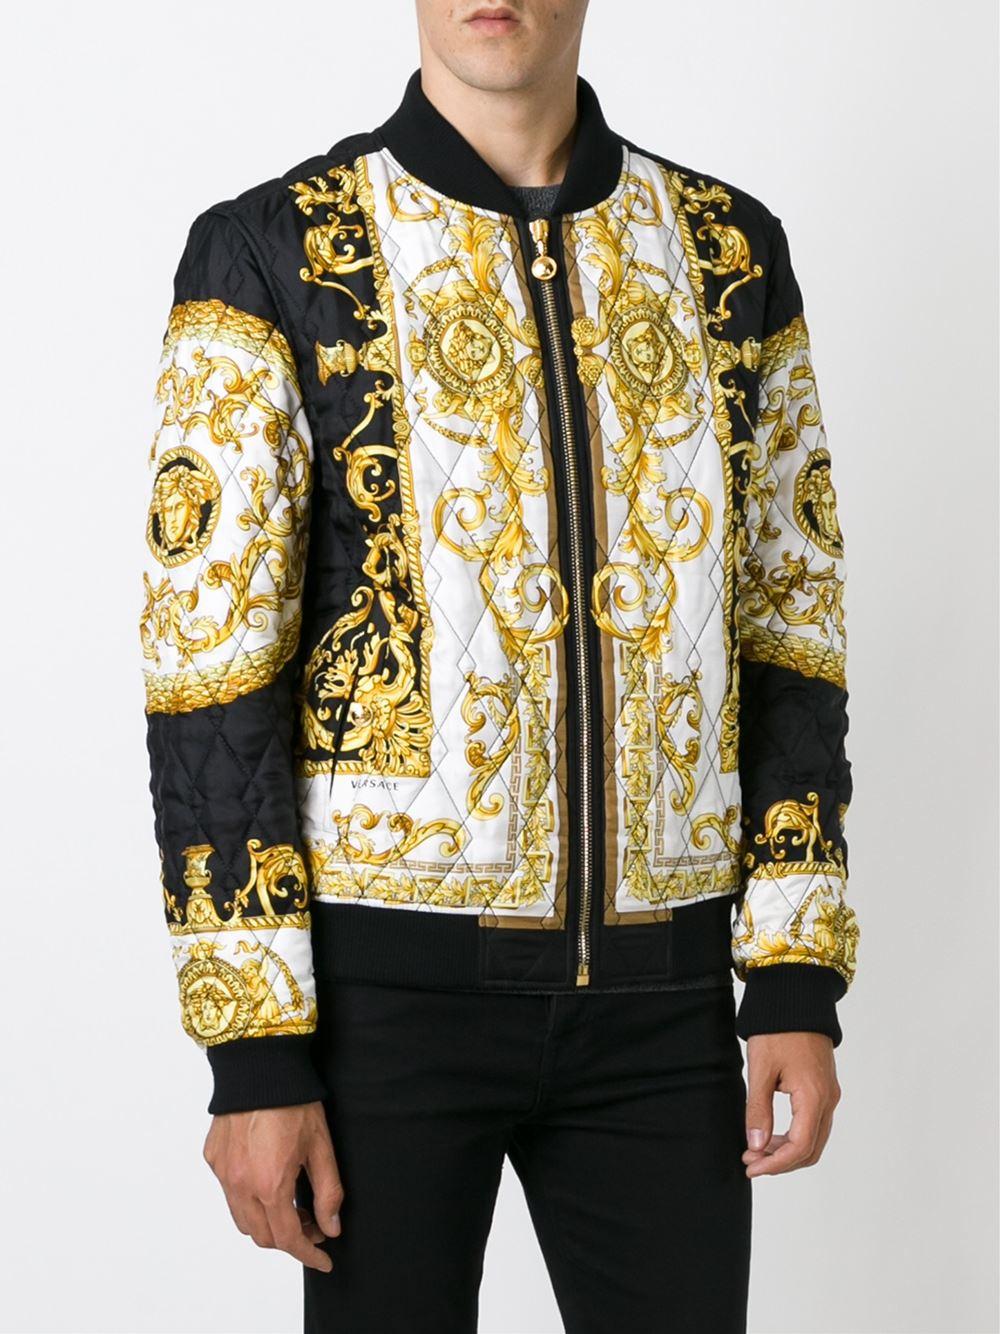 Gold versace t shirts memes - Hm herren jeans ...